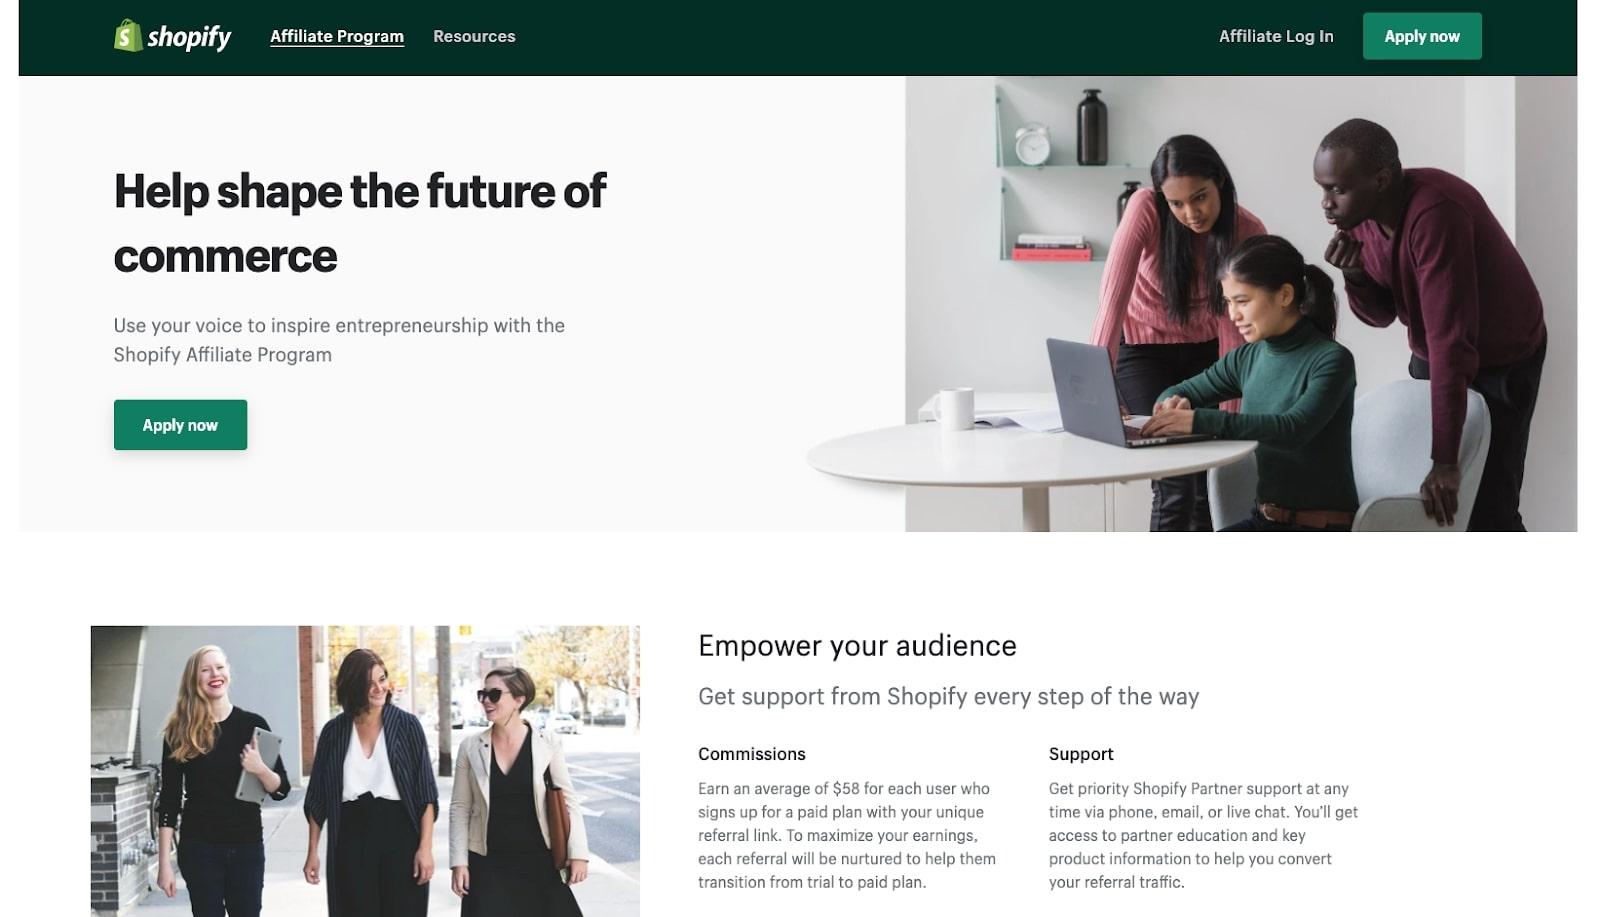 Screenshot of Shopify affiliate program website